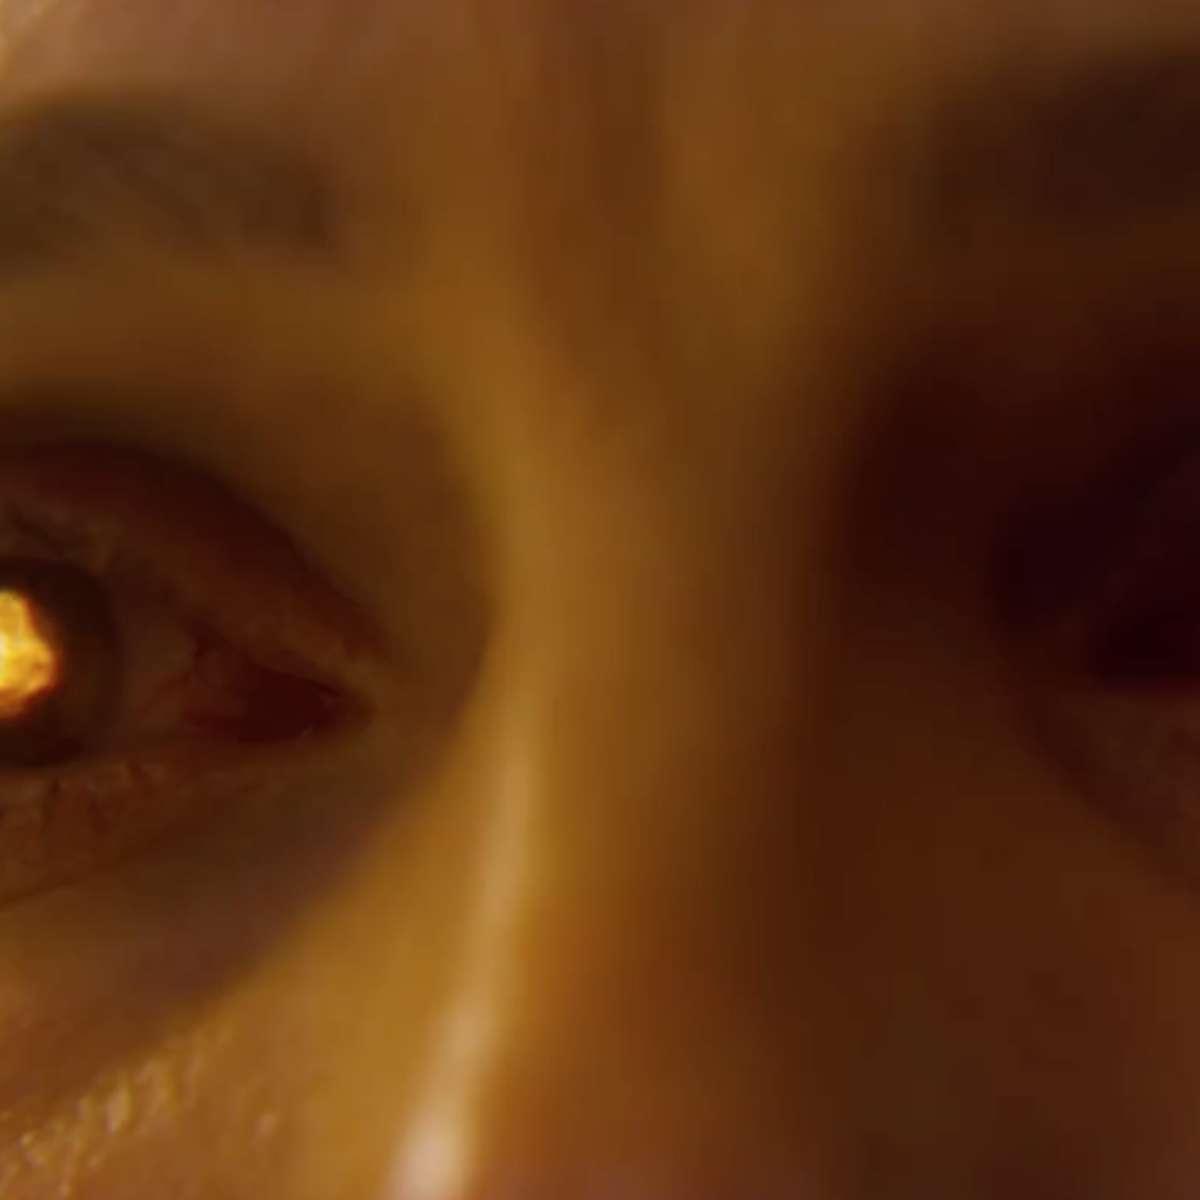 annihilation_eyes_screenshot.png